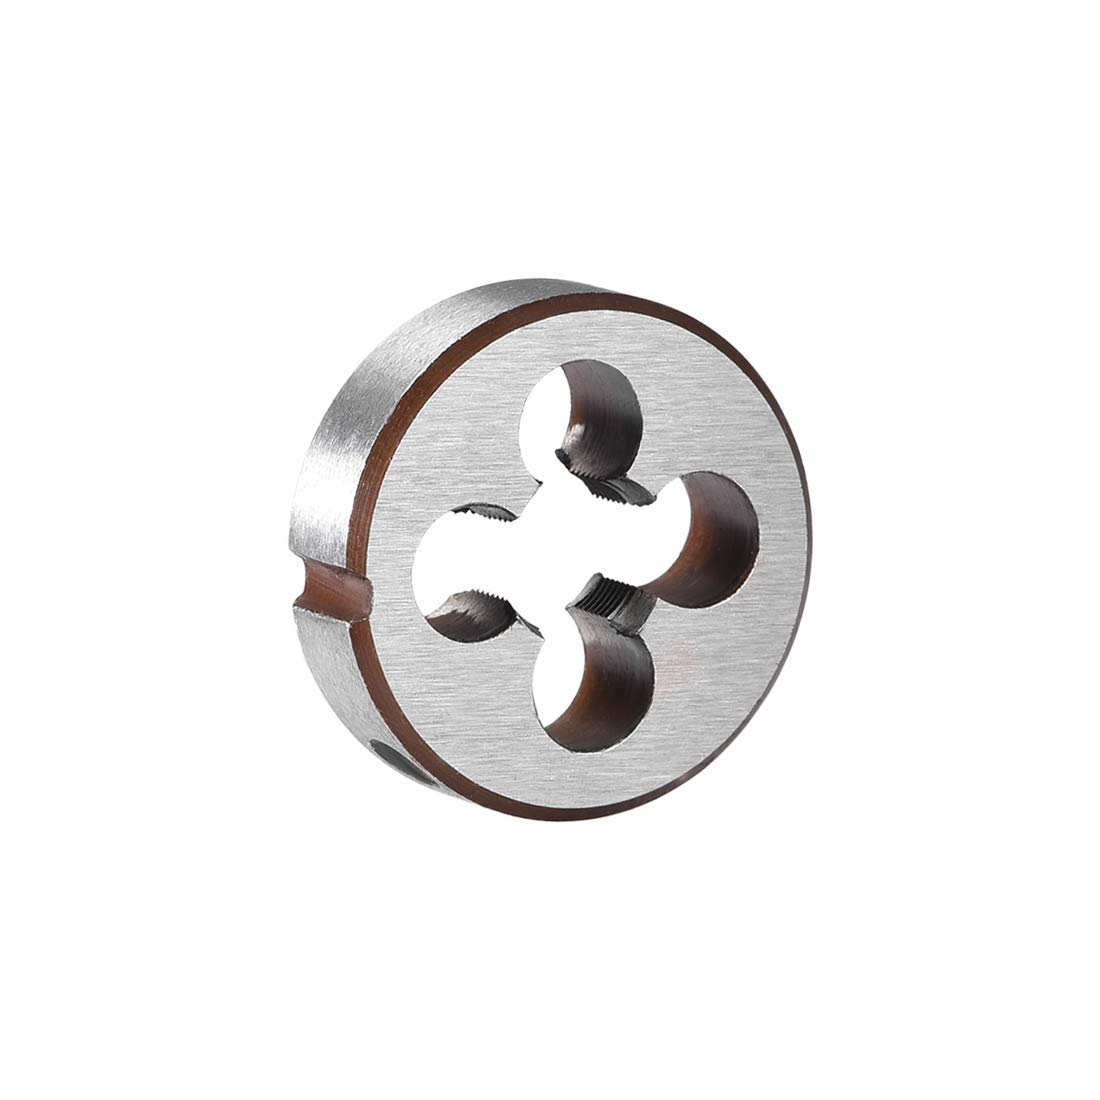 M8 M8x0.5 Metric Pitch Round die Cut on Right Hand Thread die Thread die HSS high Speed Steel Screw die Tool